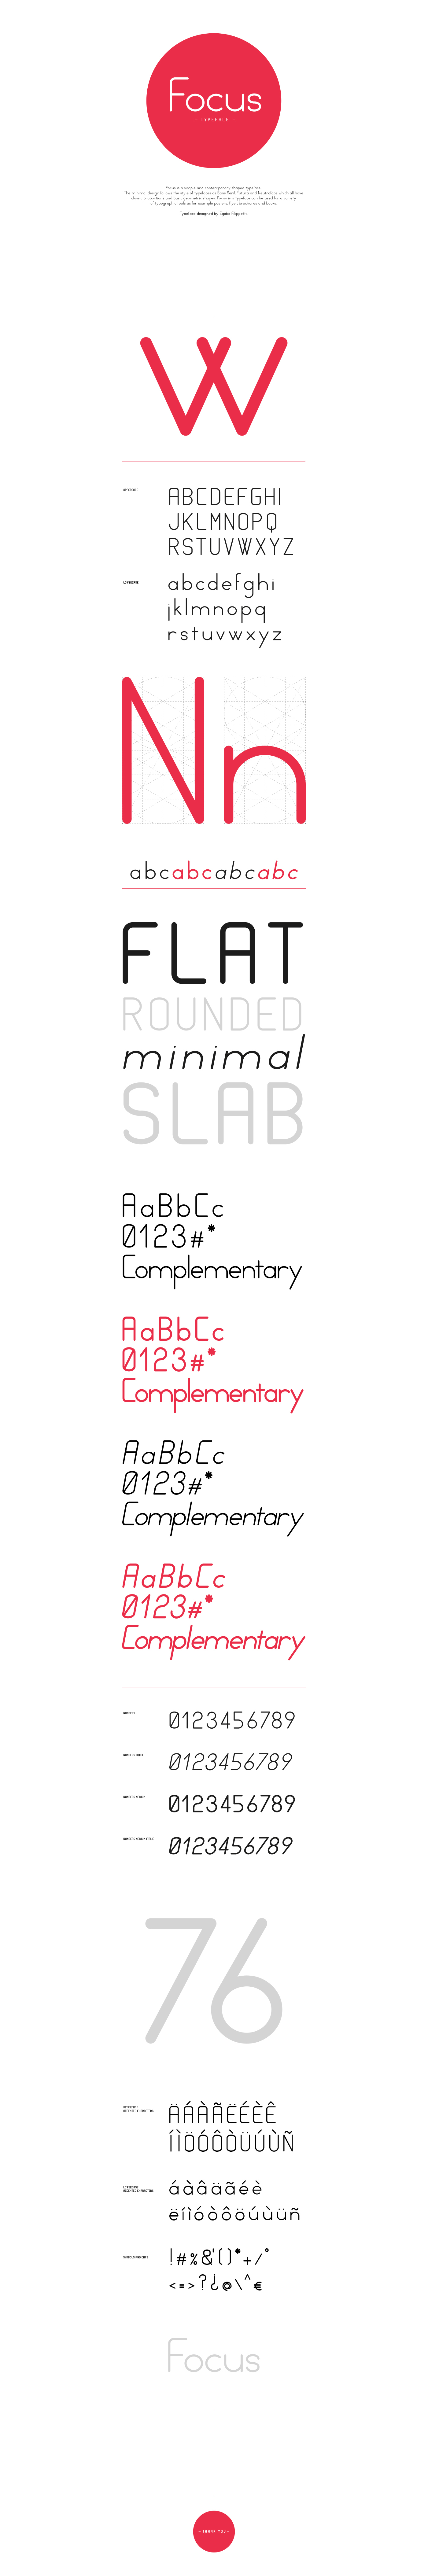 free Free font font type Typeface Focus